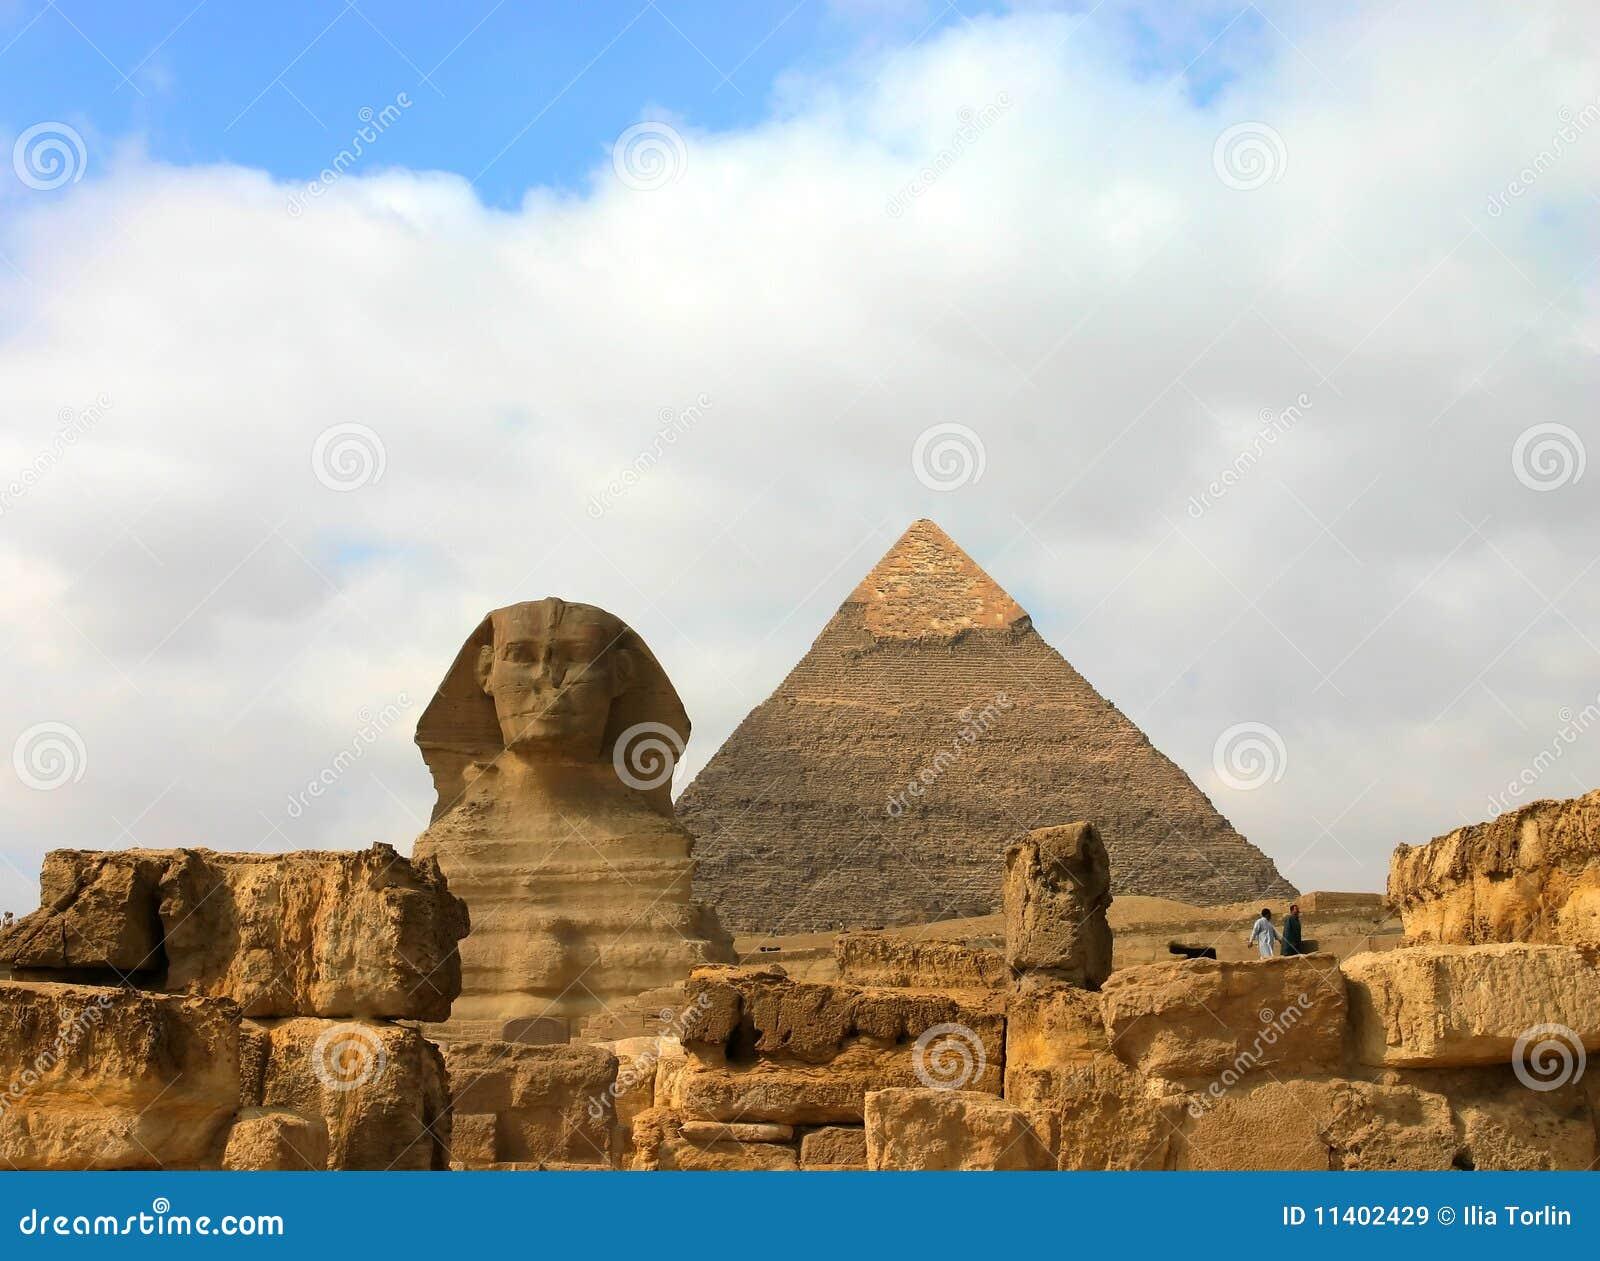 Pyramides et sphinx de Giza. l Egypte.